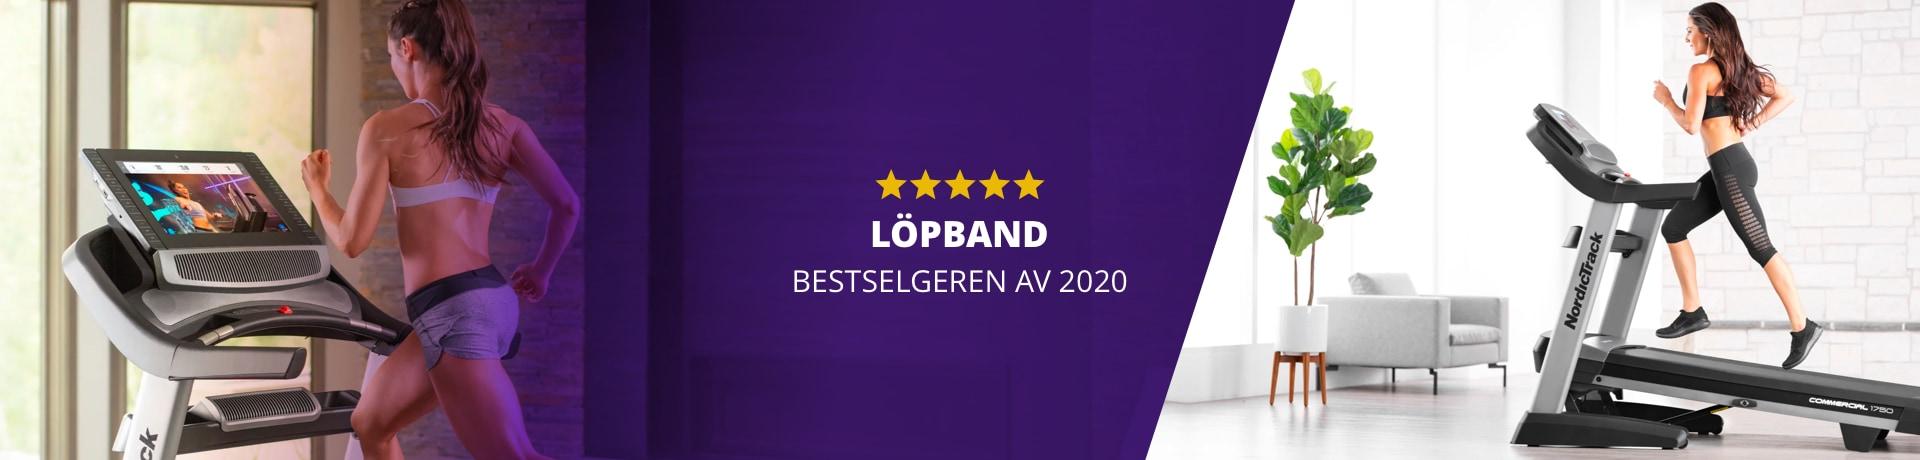 sale-laufband